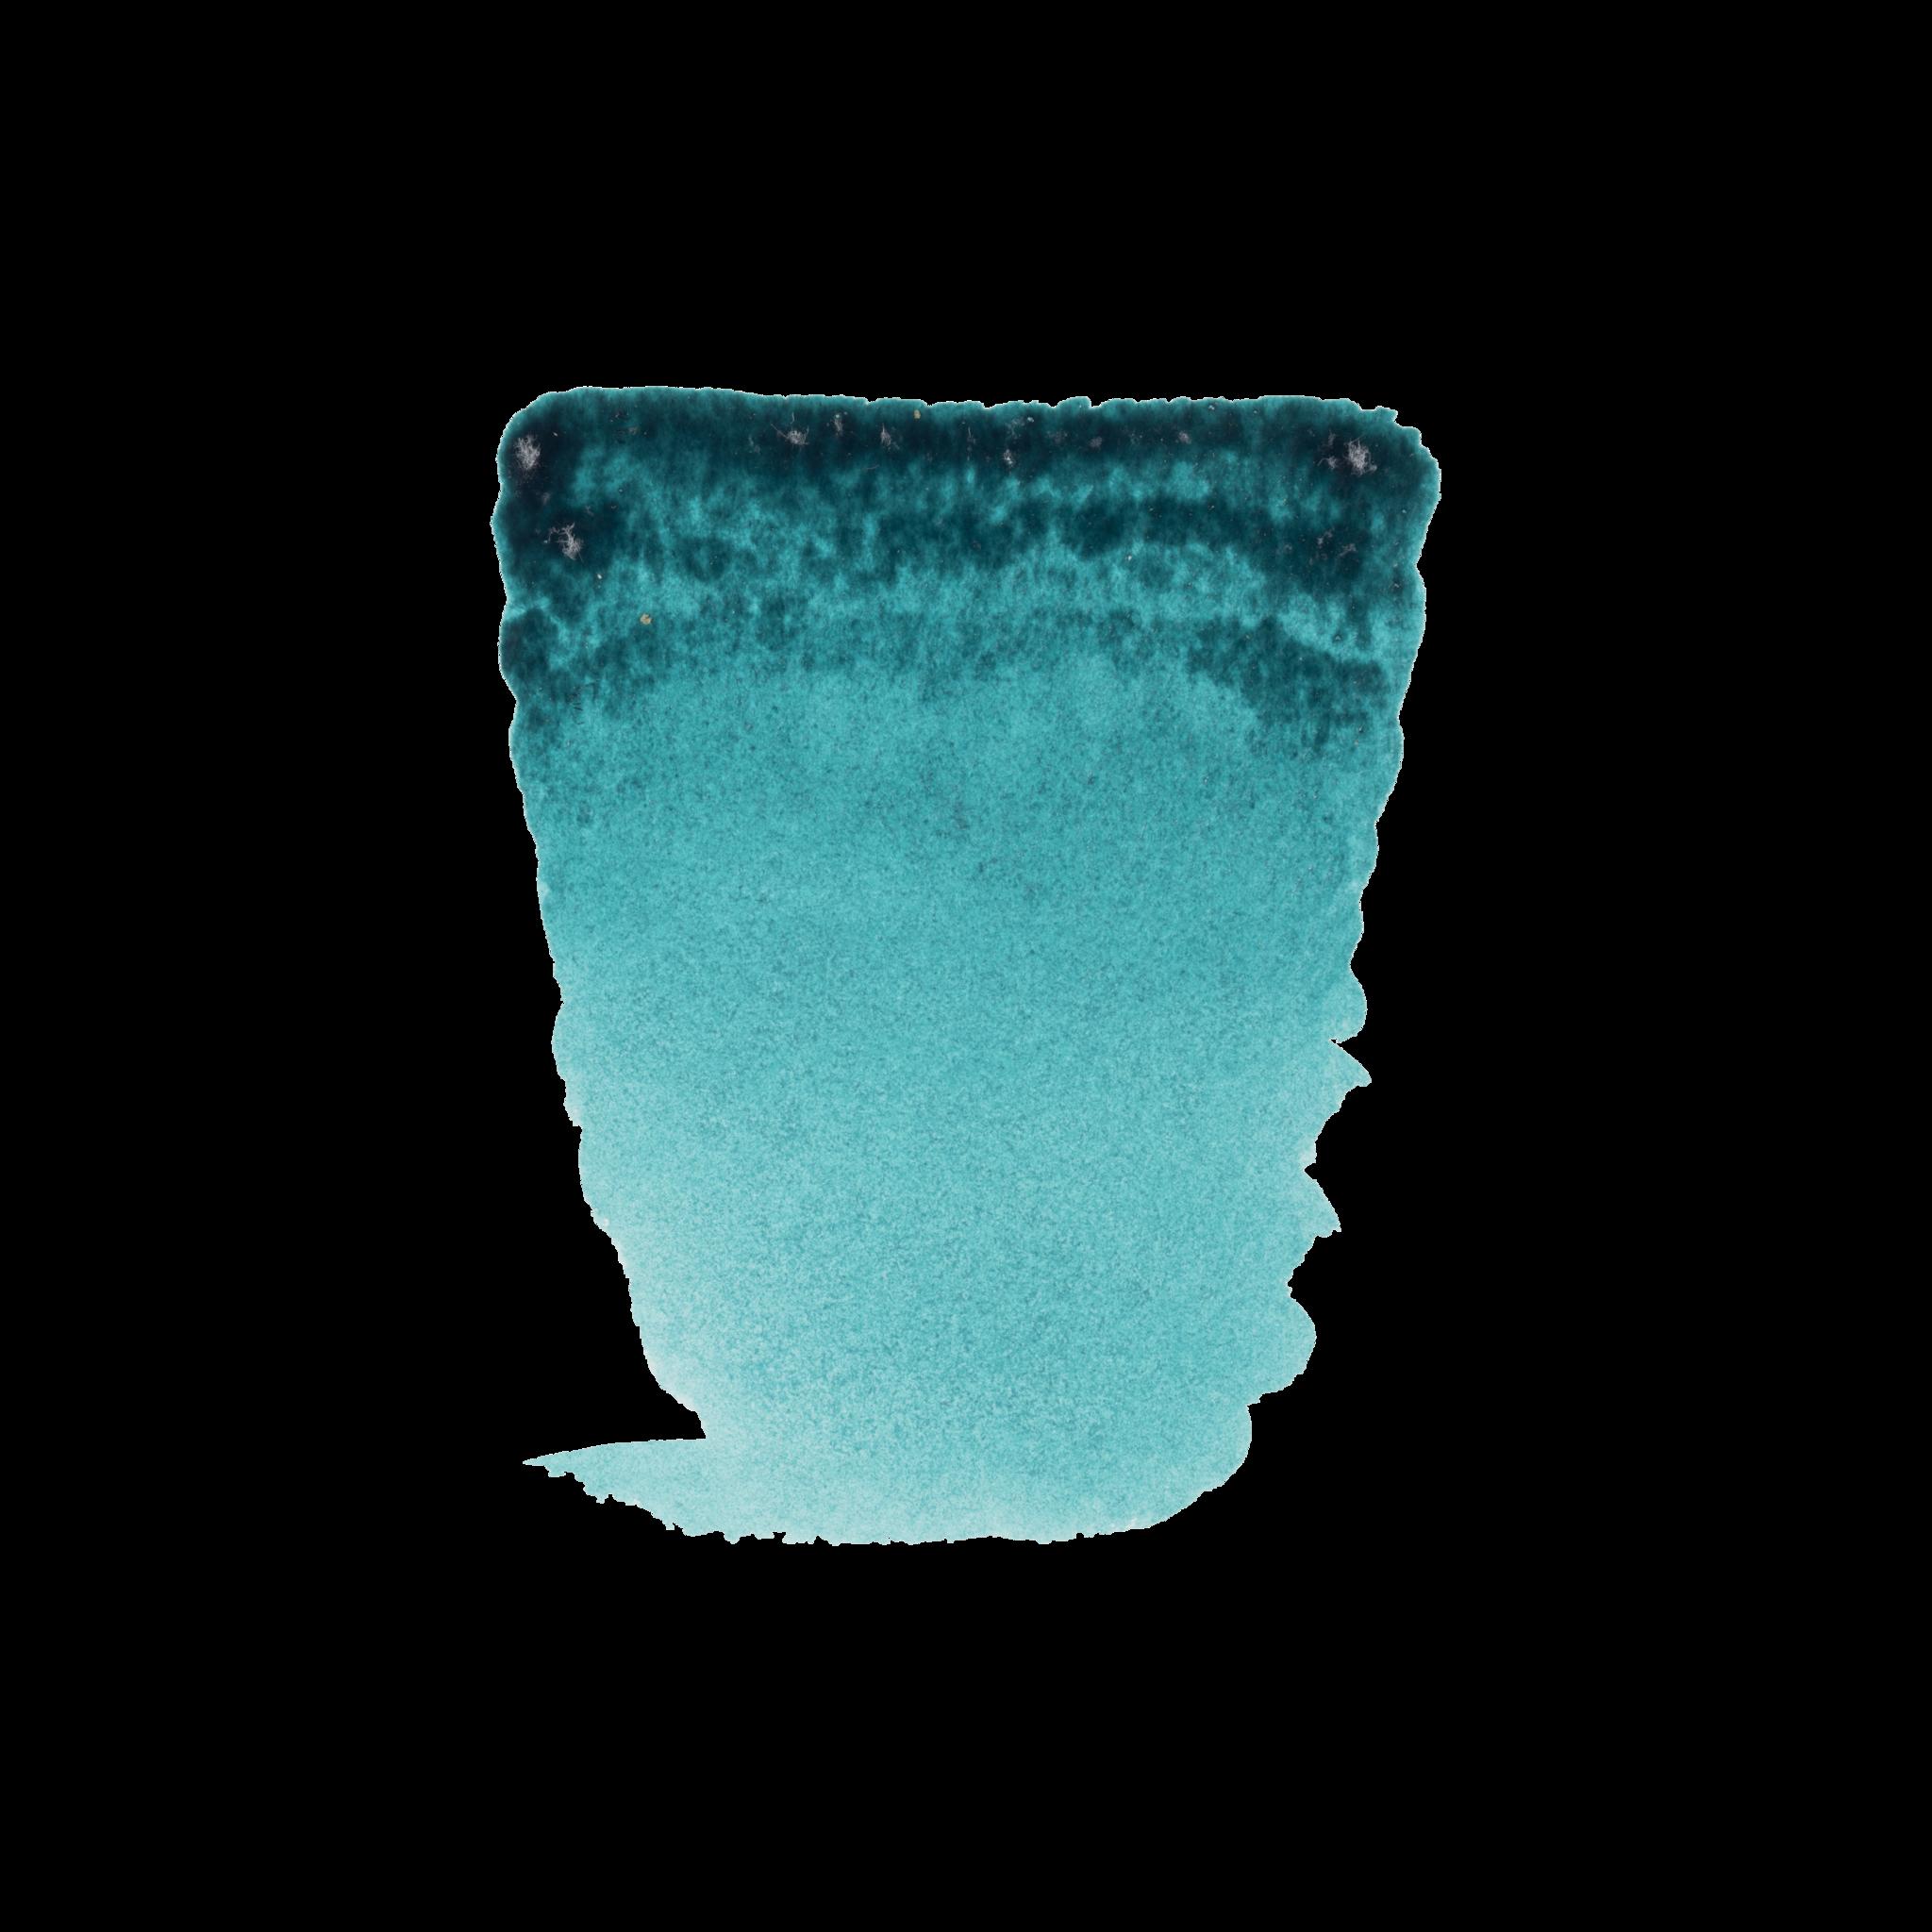 Blauwgroen 10ml